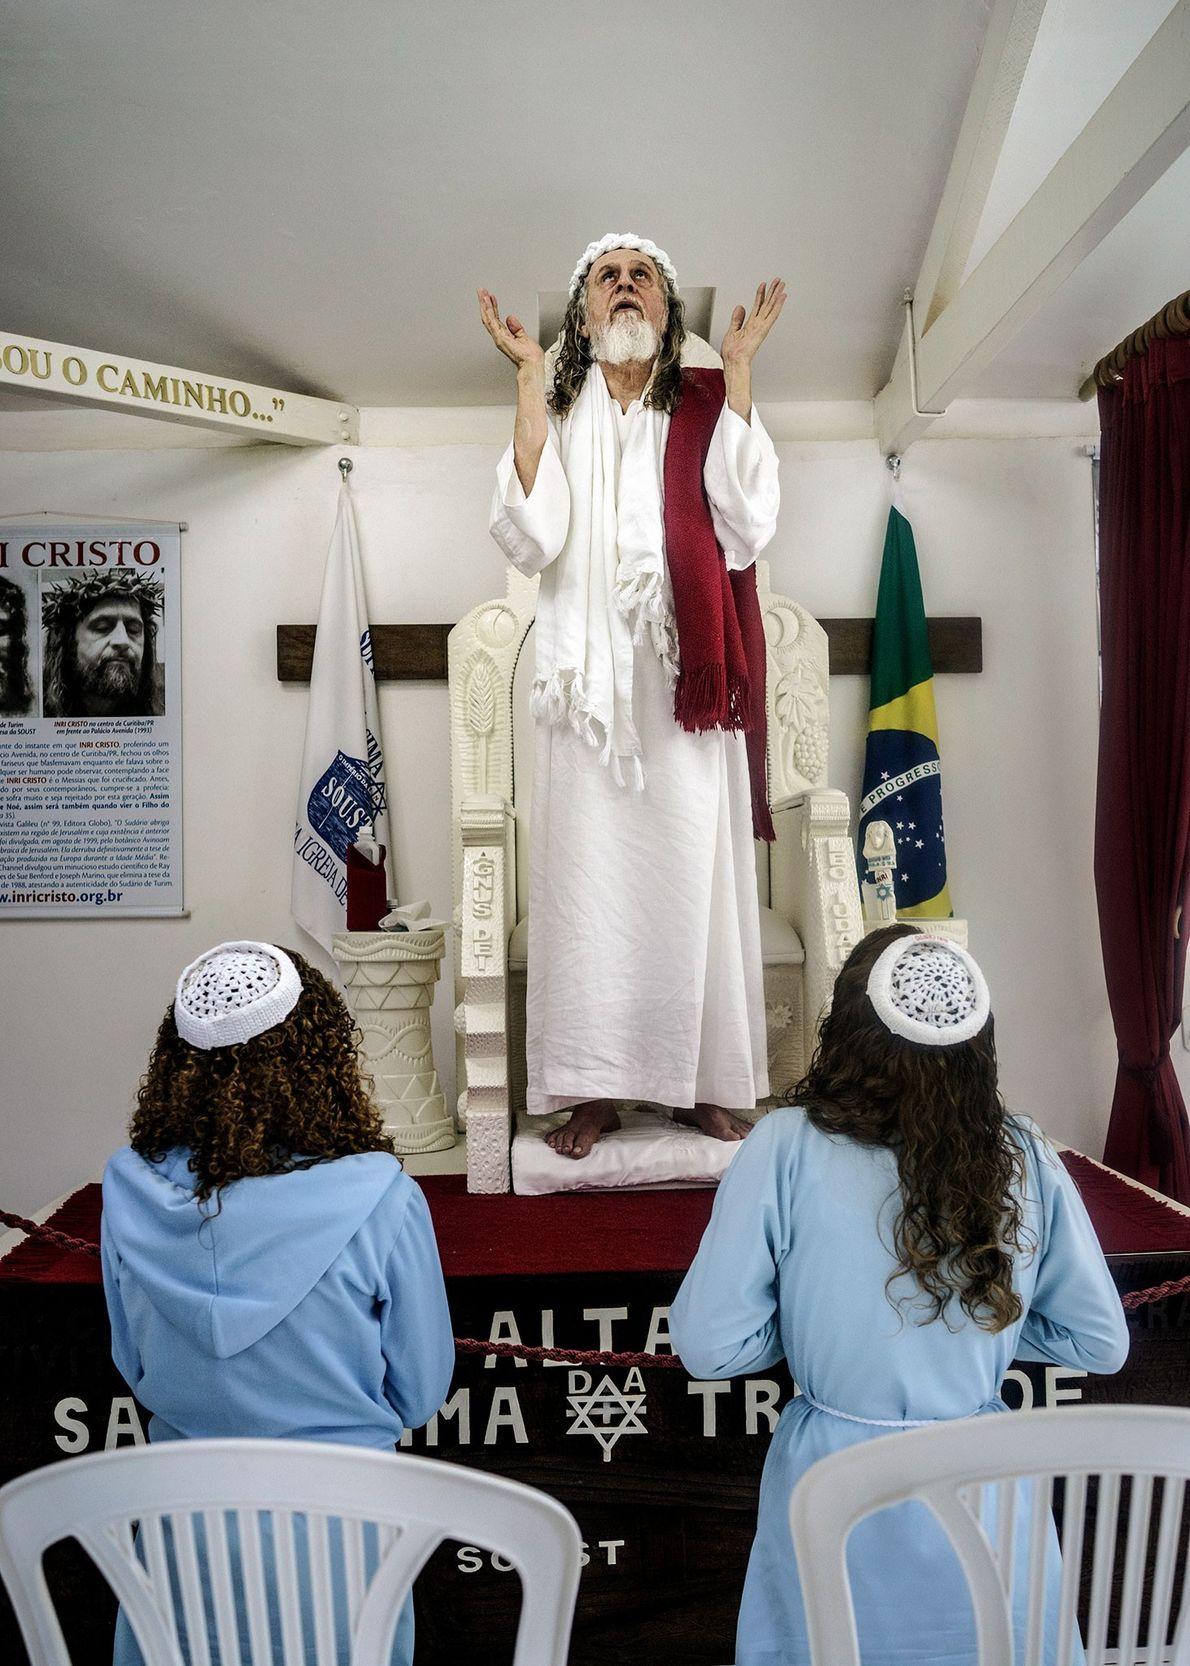 INRI Cristo en una liturgia